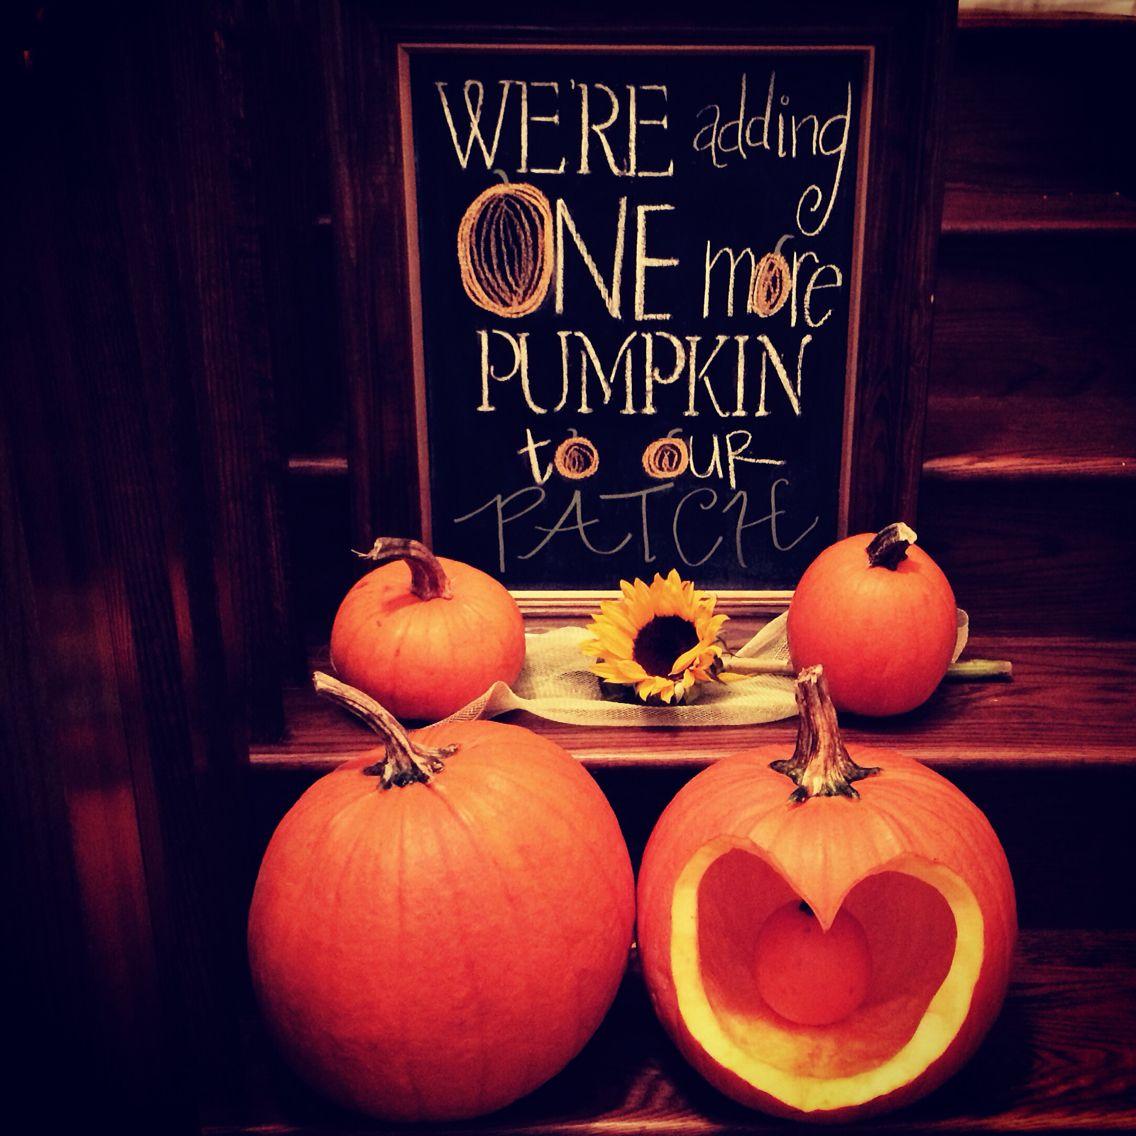 Fun Fall Birth Announcement were adding one more pumpkin to our – Fall Birth Announcements